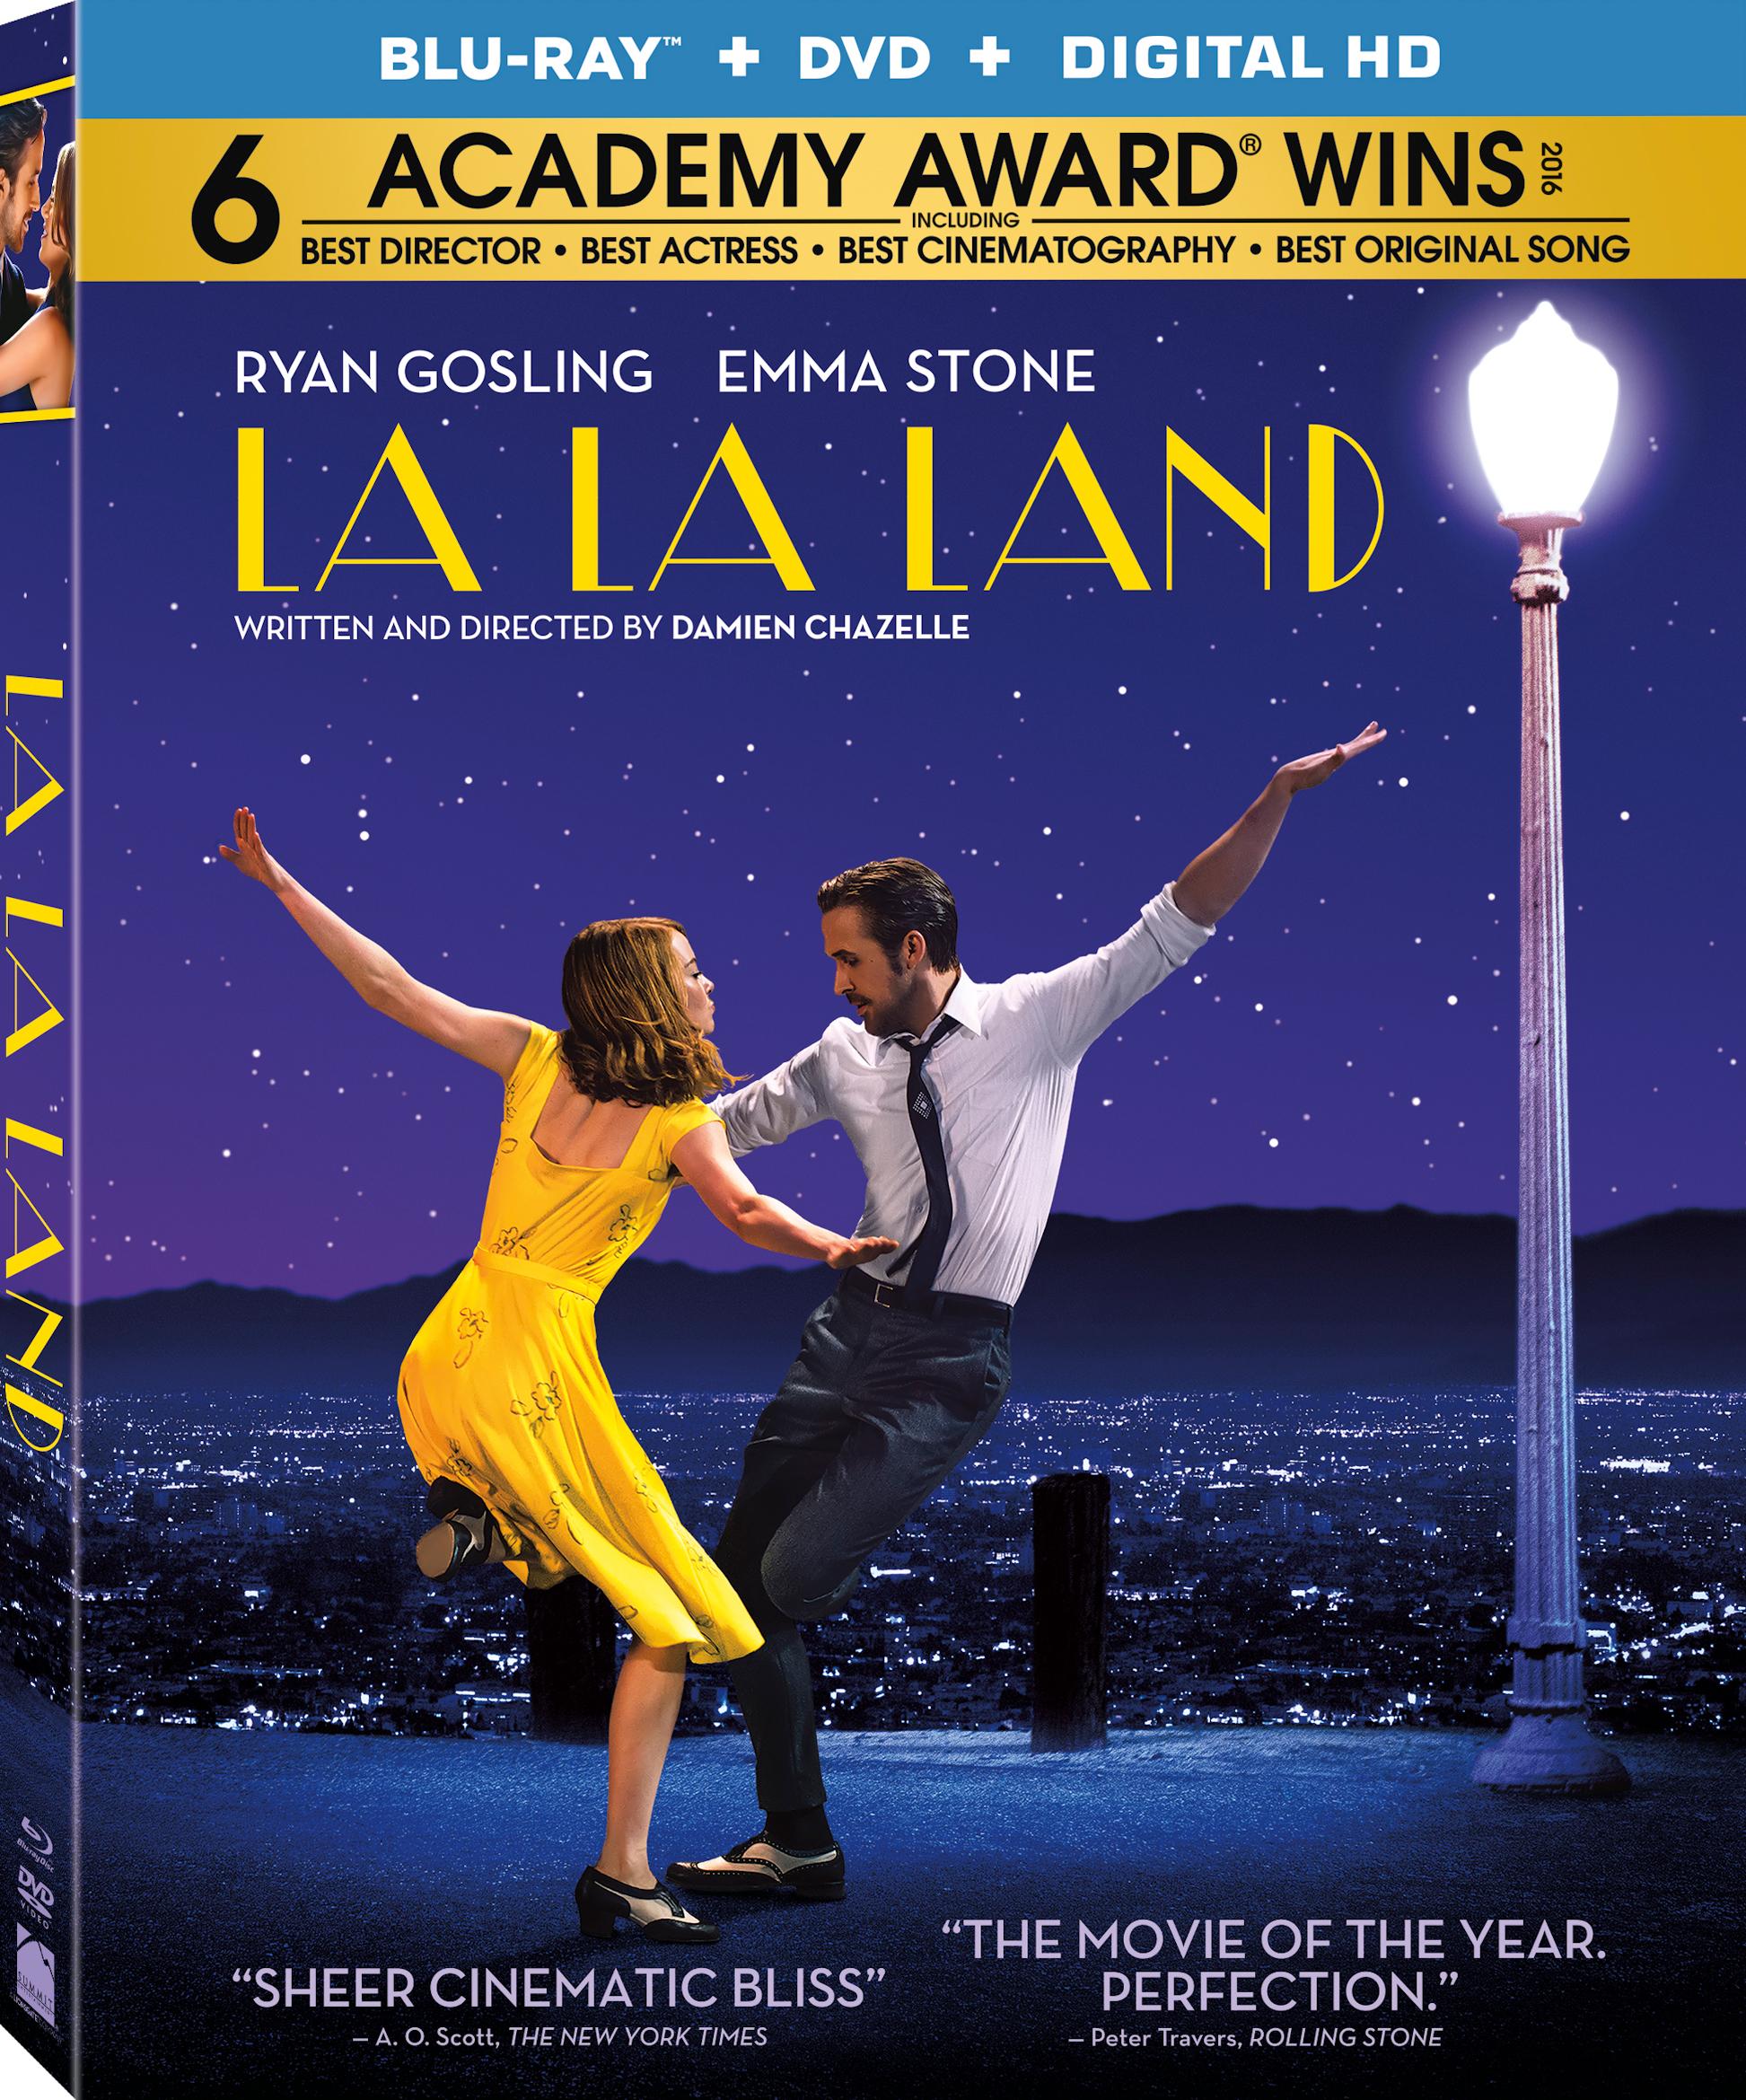 La La Land (2016) poster image